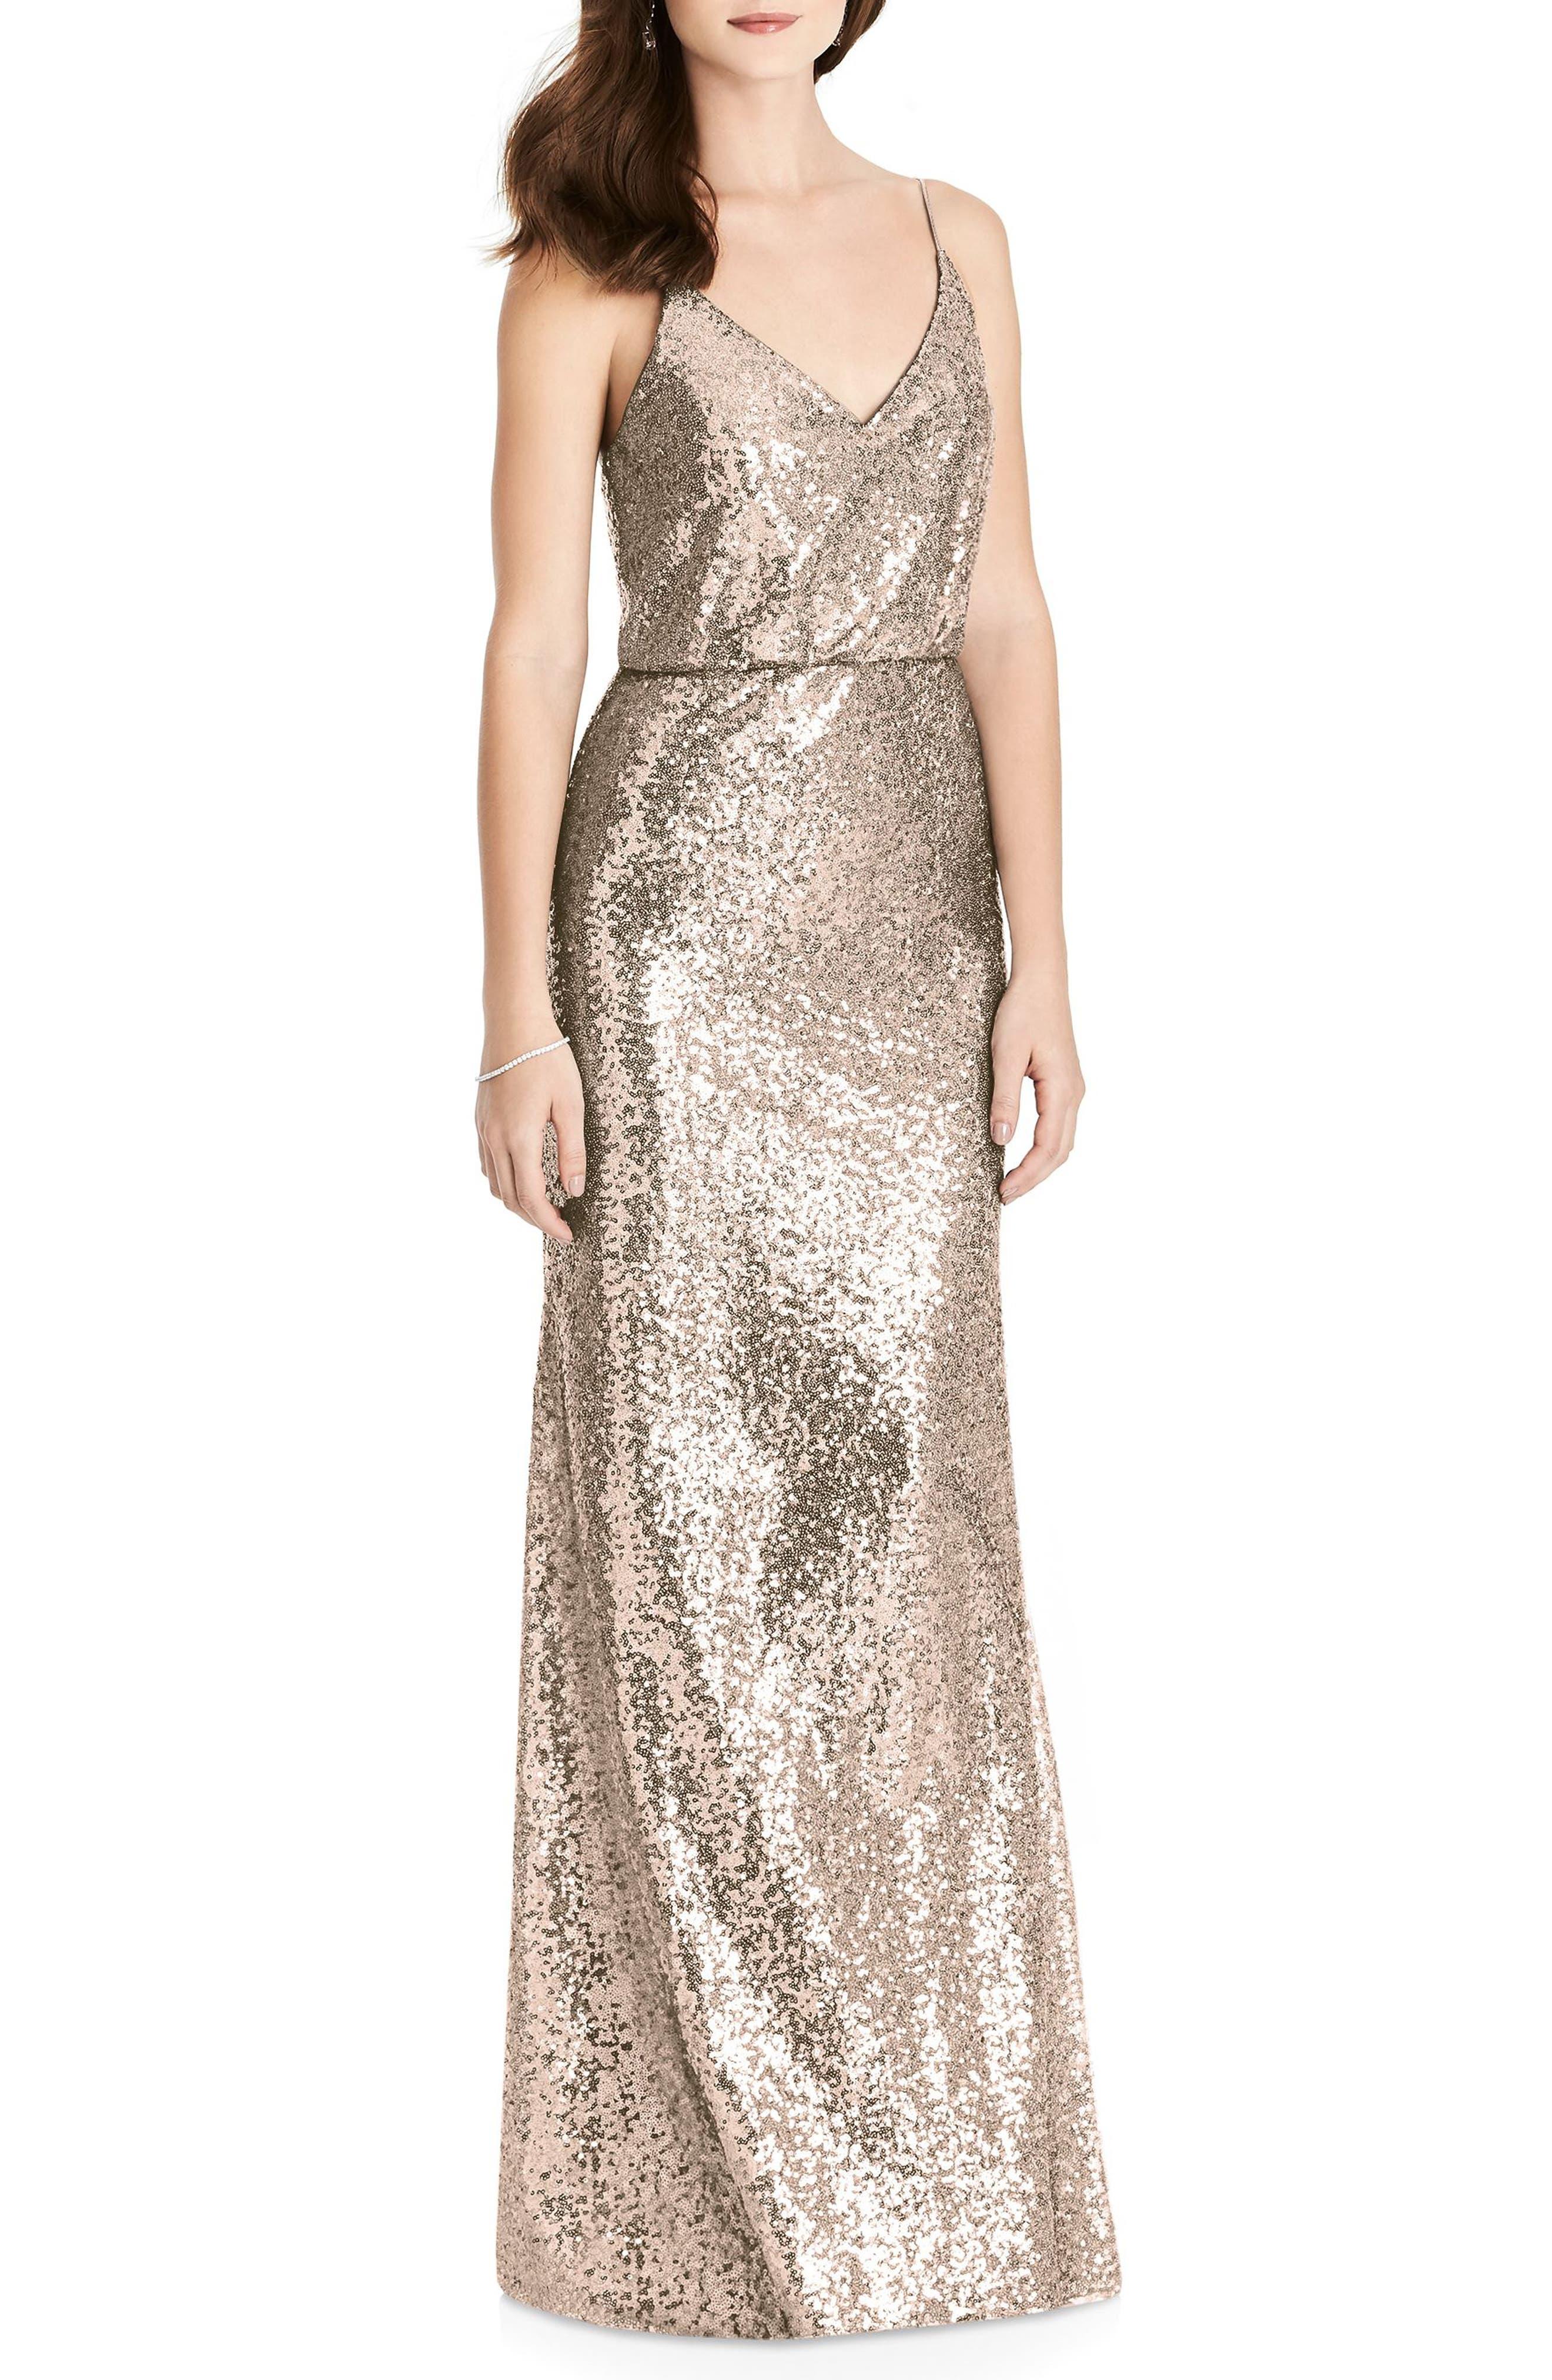 Main Image - After Six Sequin Blouson Gown